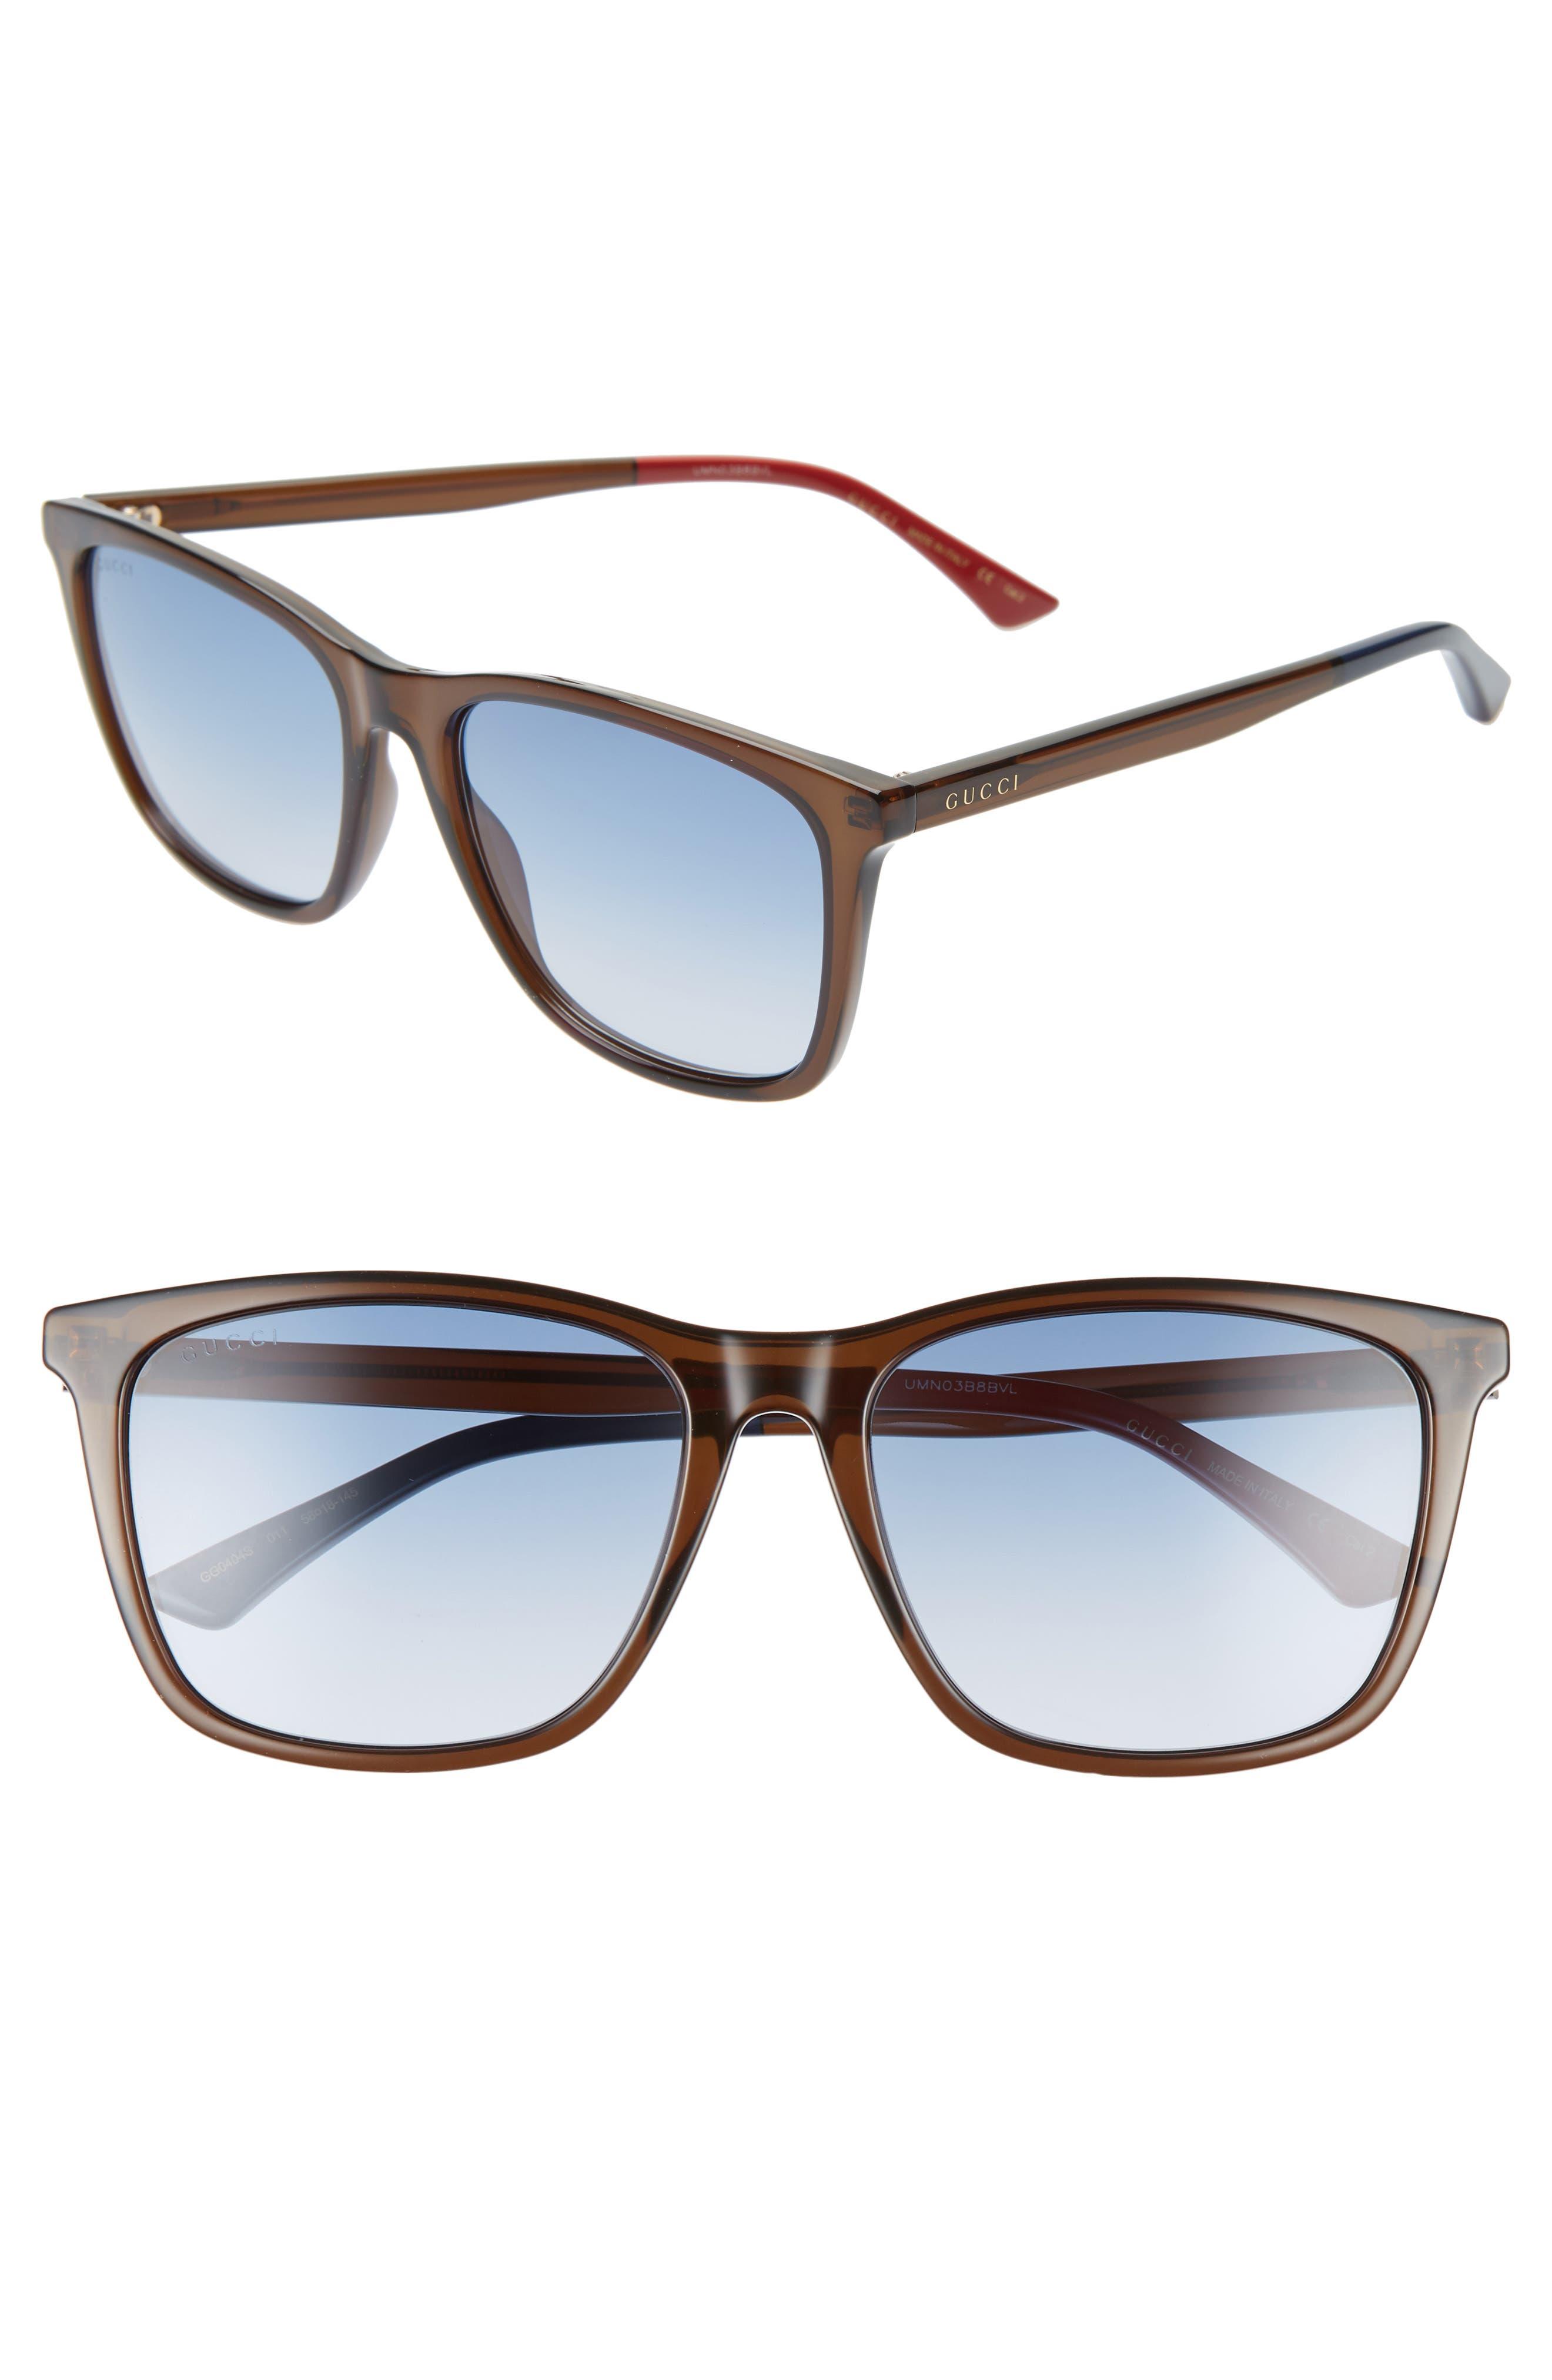 f8fcad55ceb Men s Sunglasses -  300 to  400